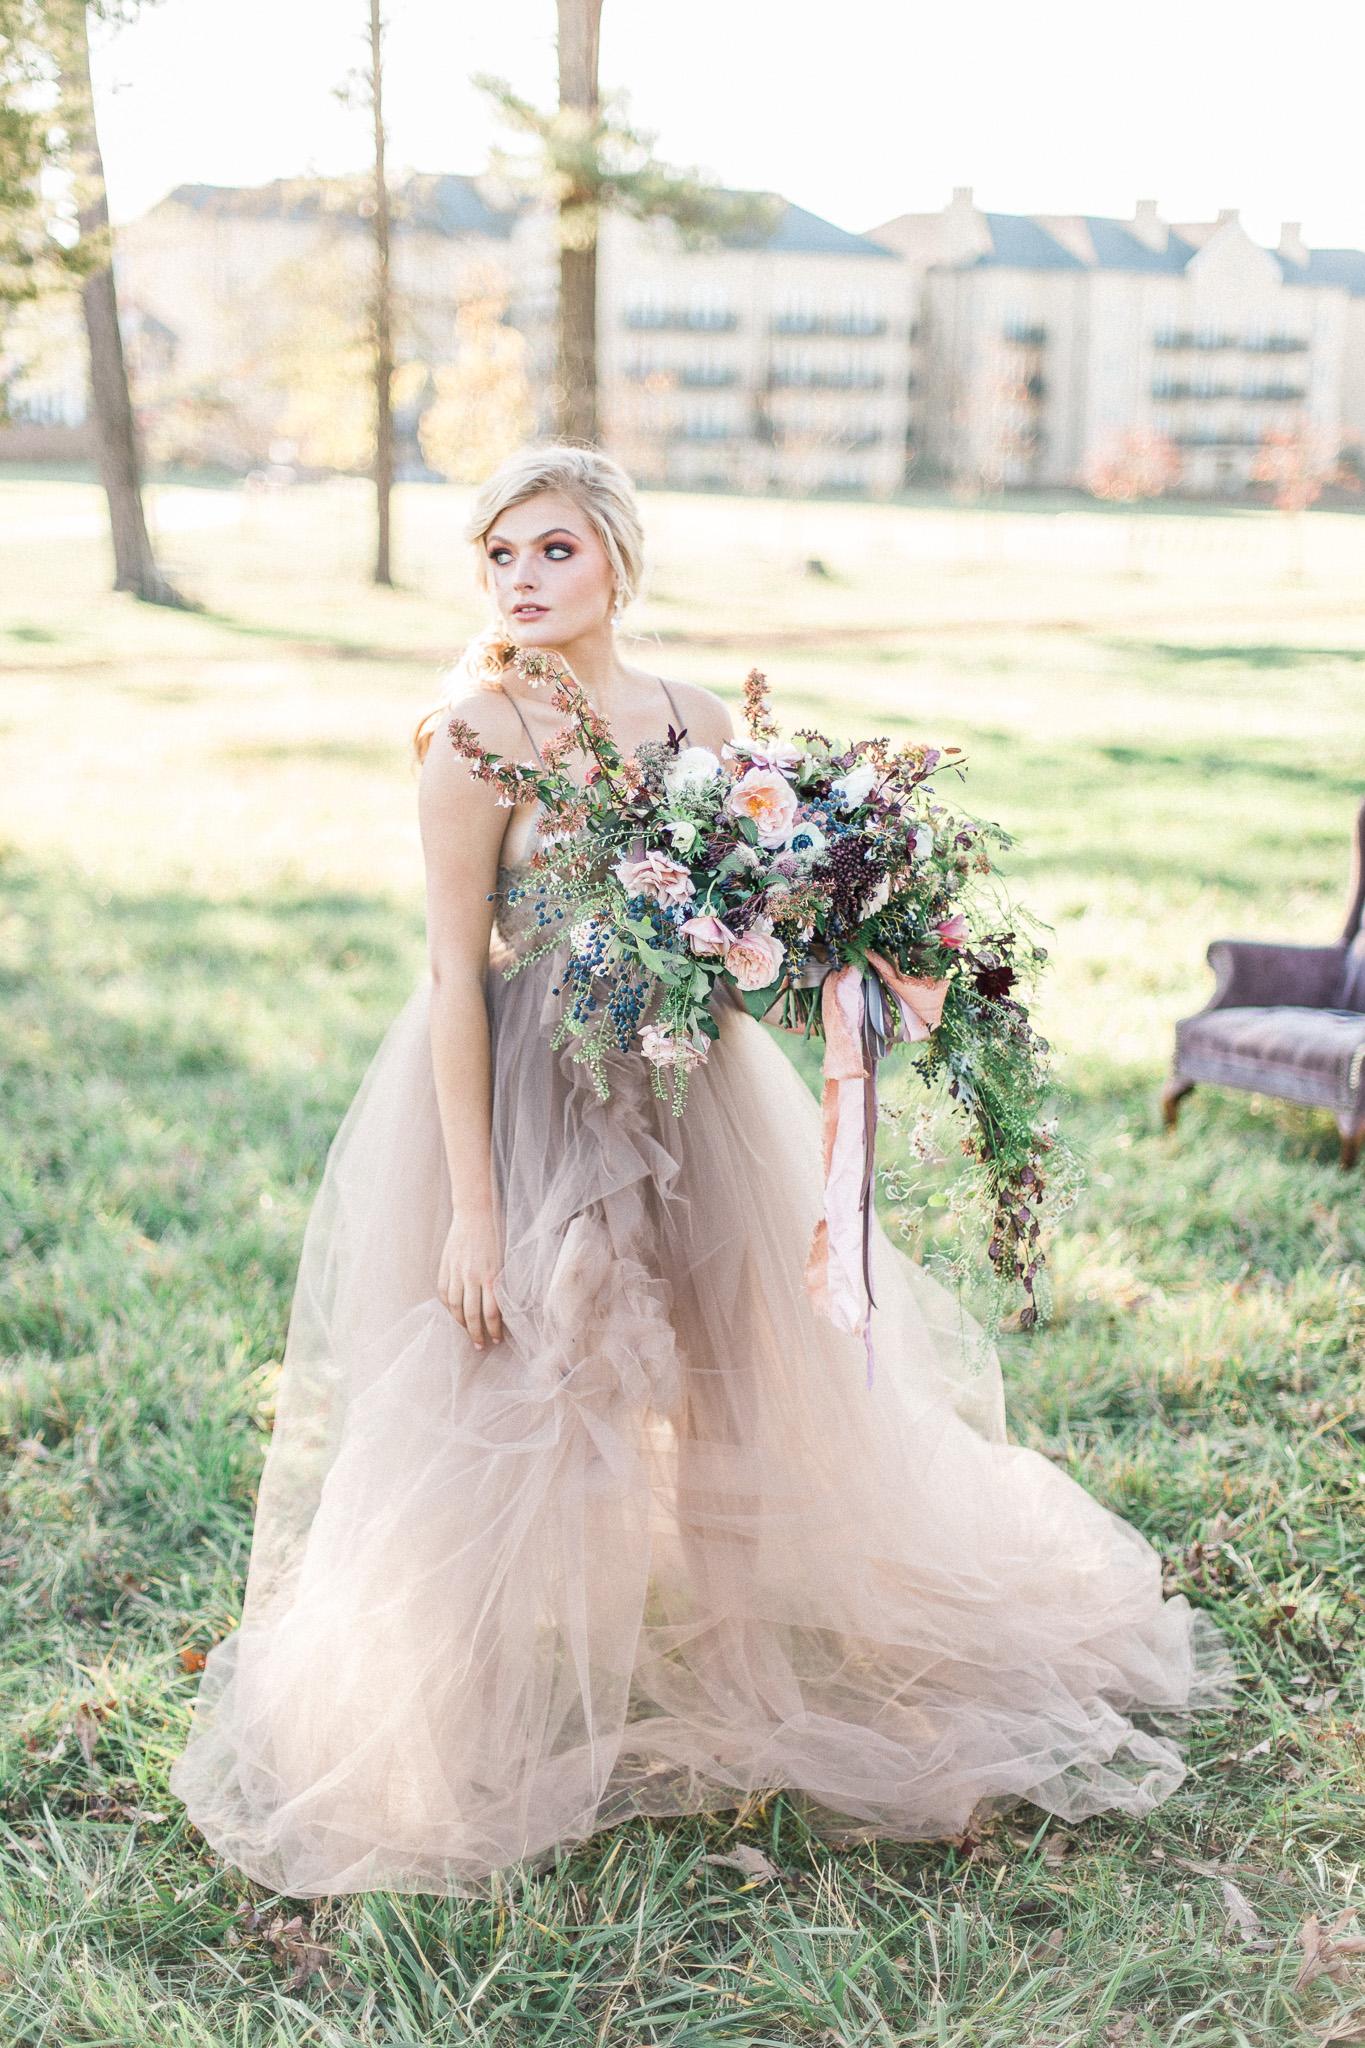 holly-chapple-wedding-bouquet